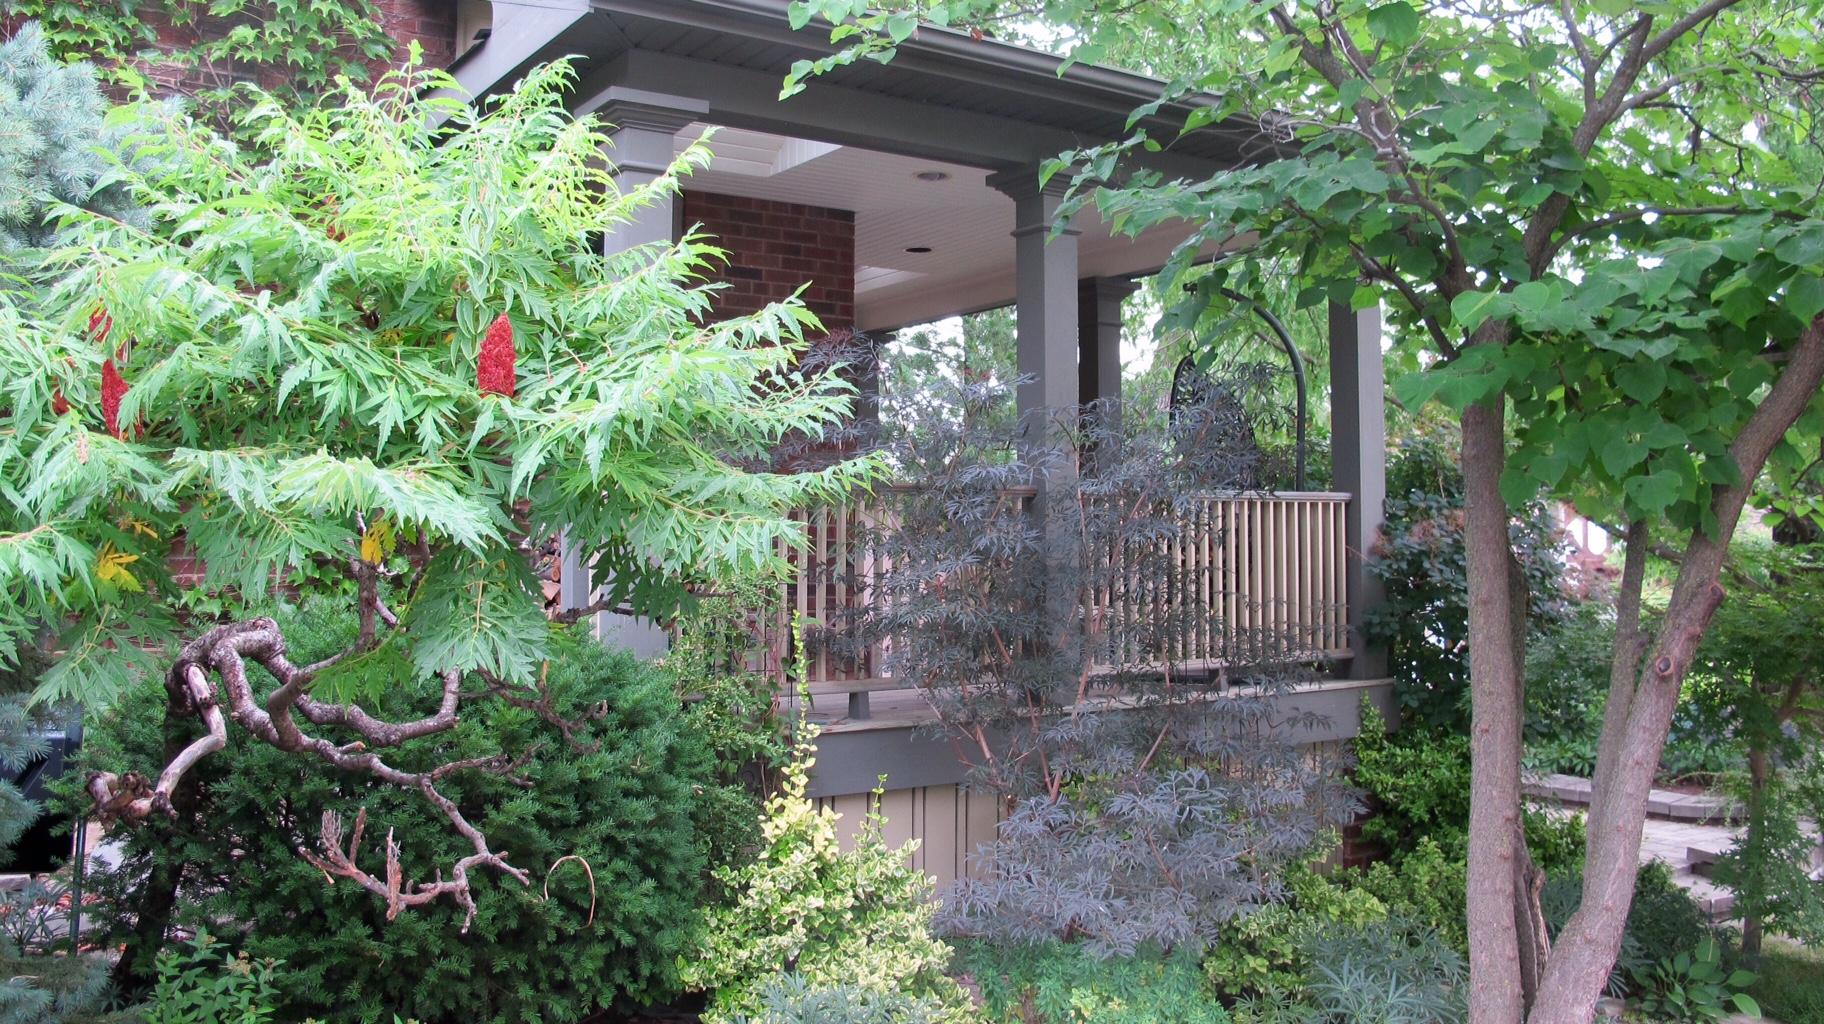 cutleaf staghorn sumac next to porch